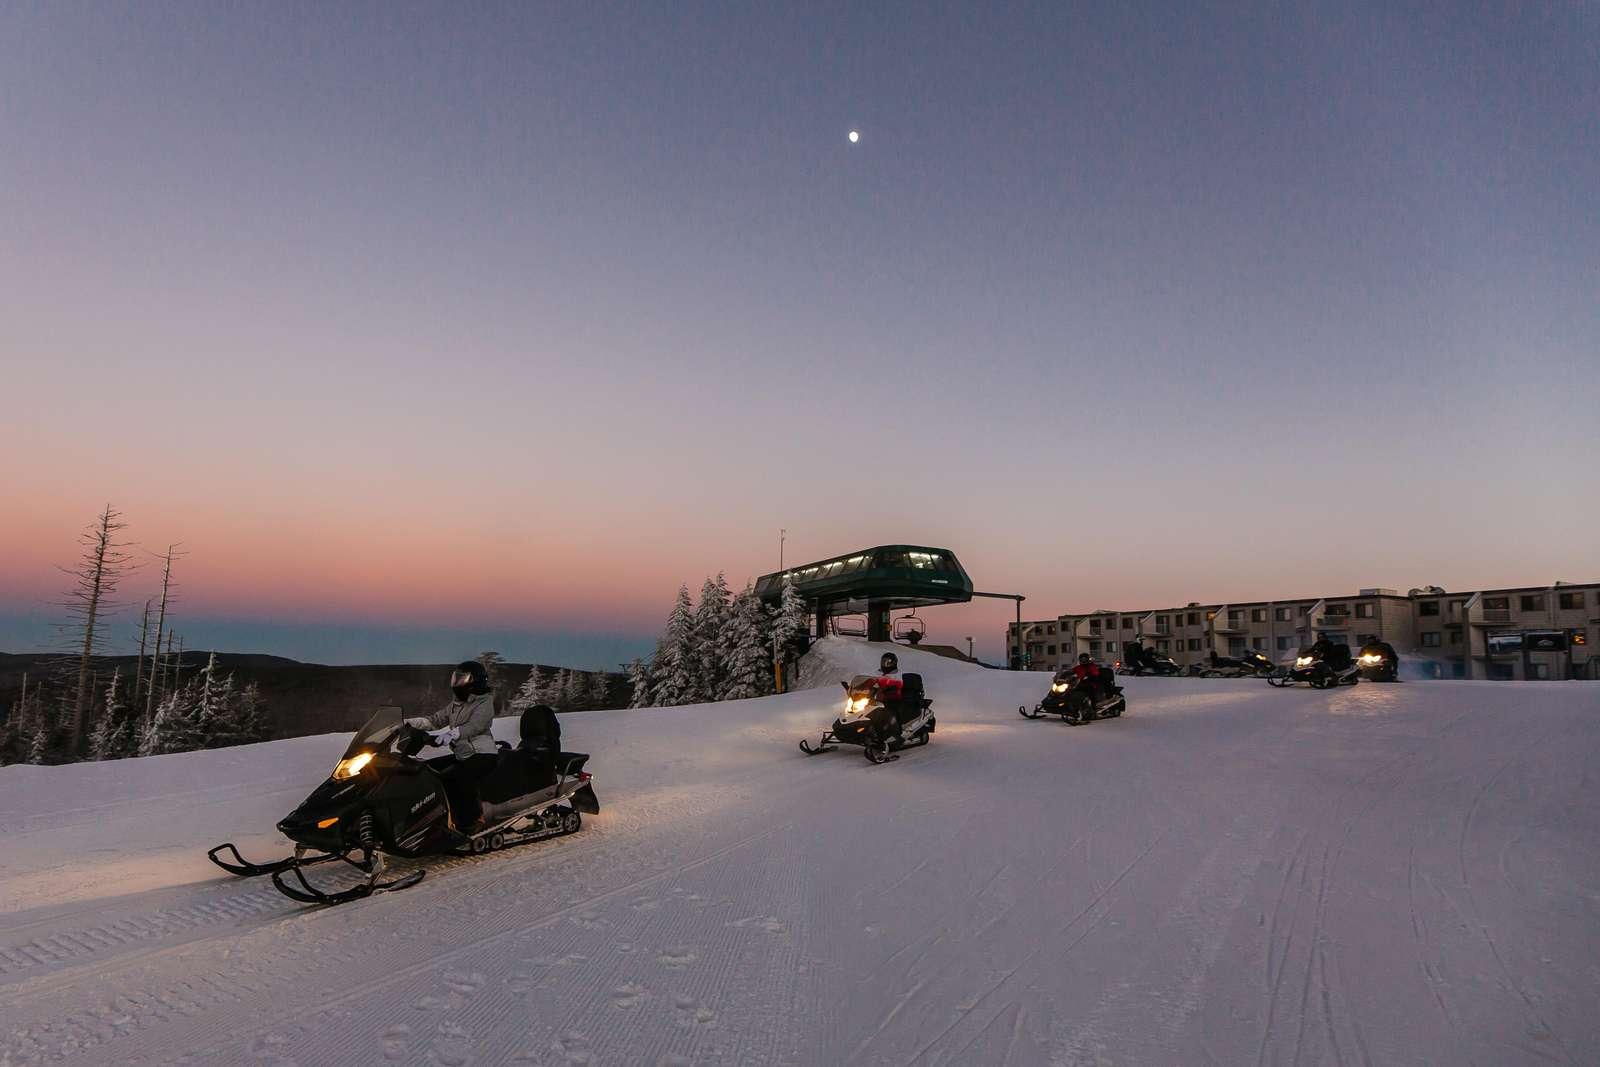 Have fun until the sun sets!